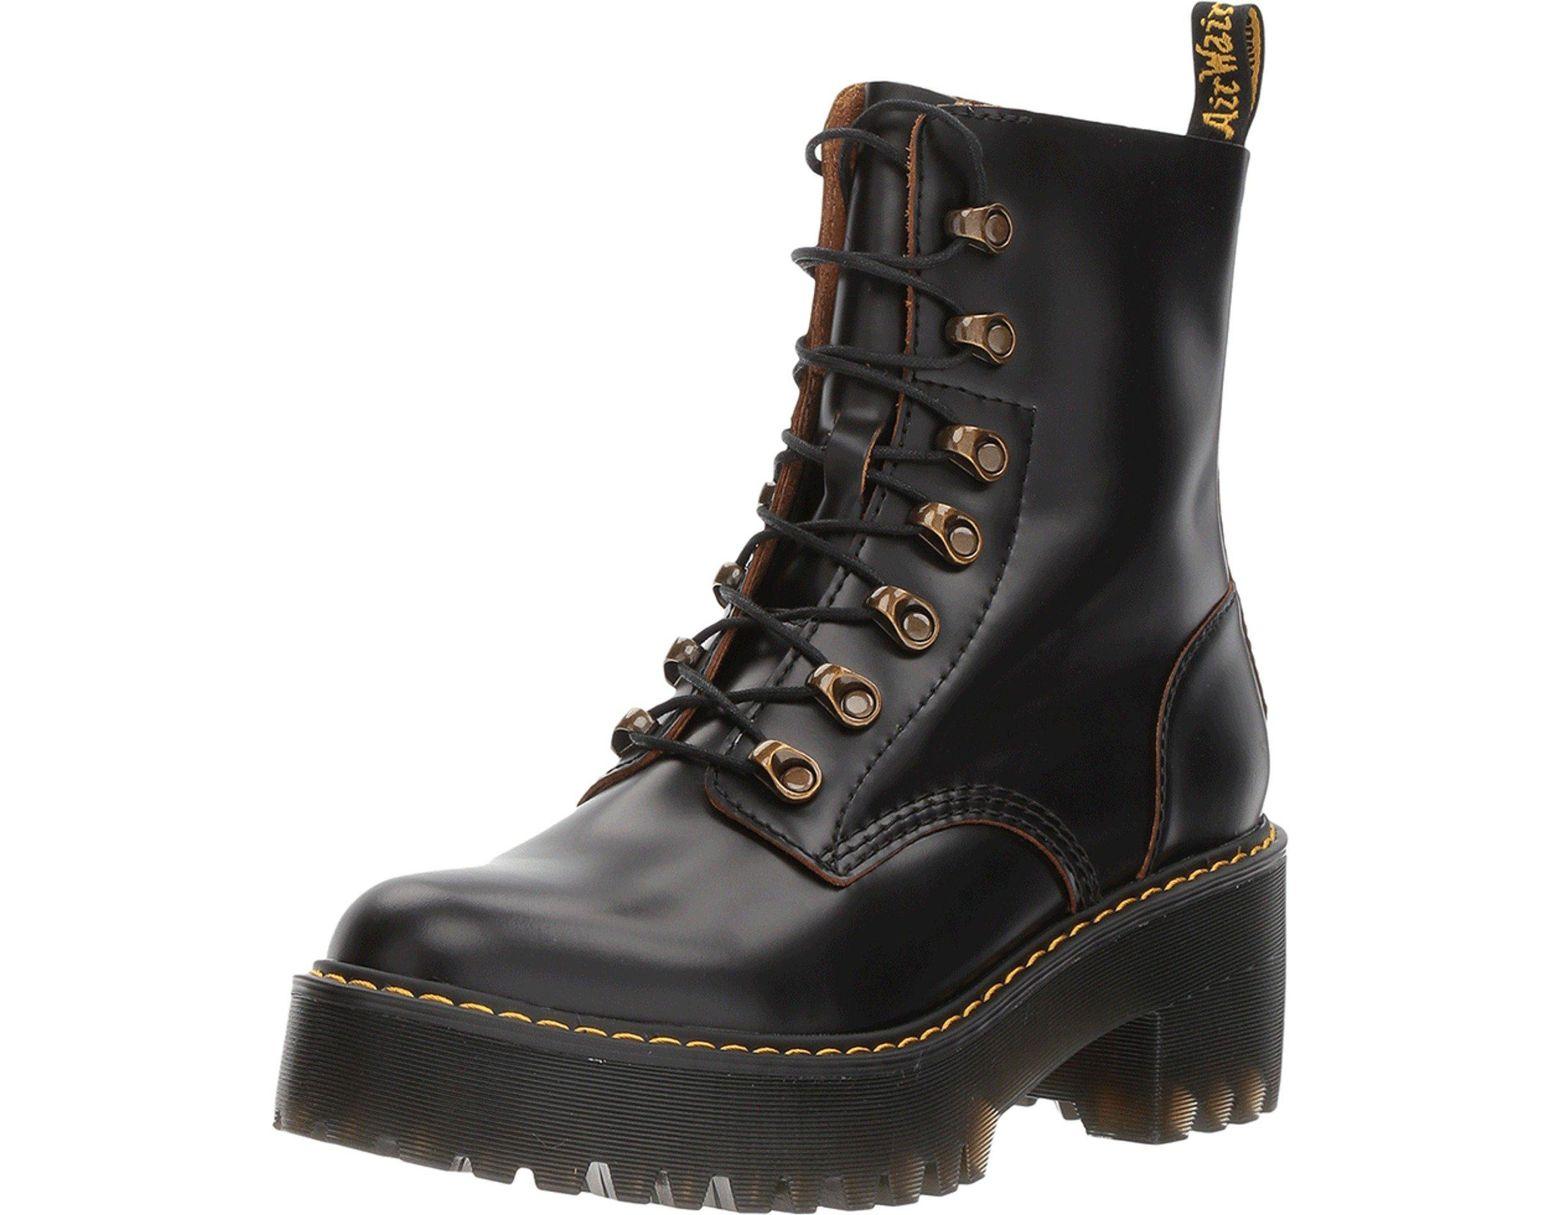 7dbec4ecc59 Women's Black Leona 7 Hook Boot